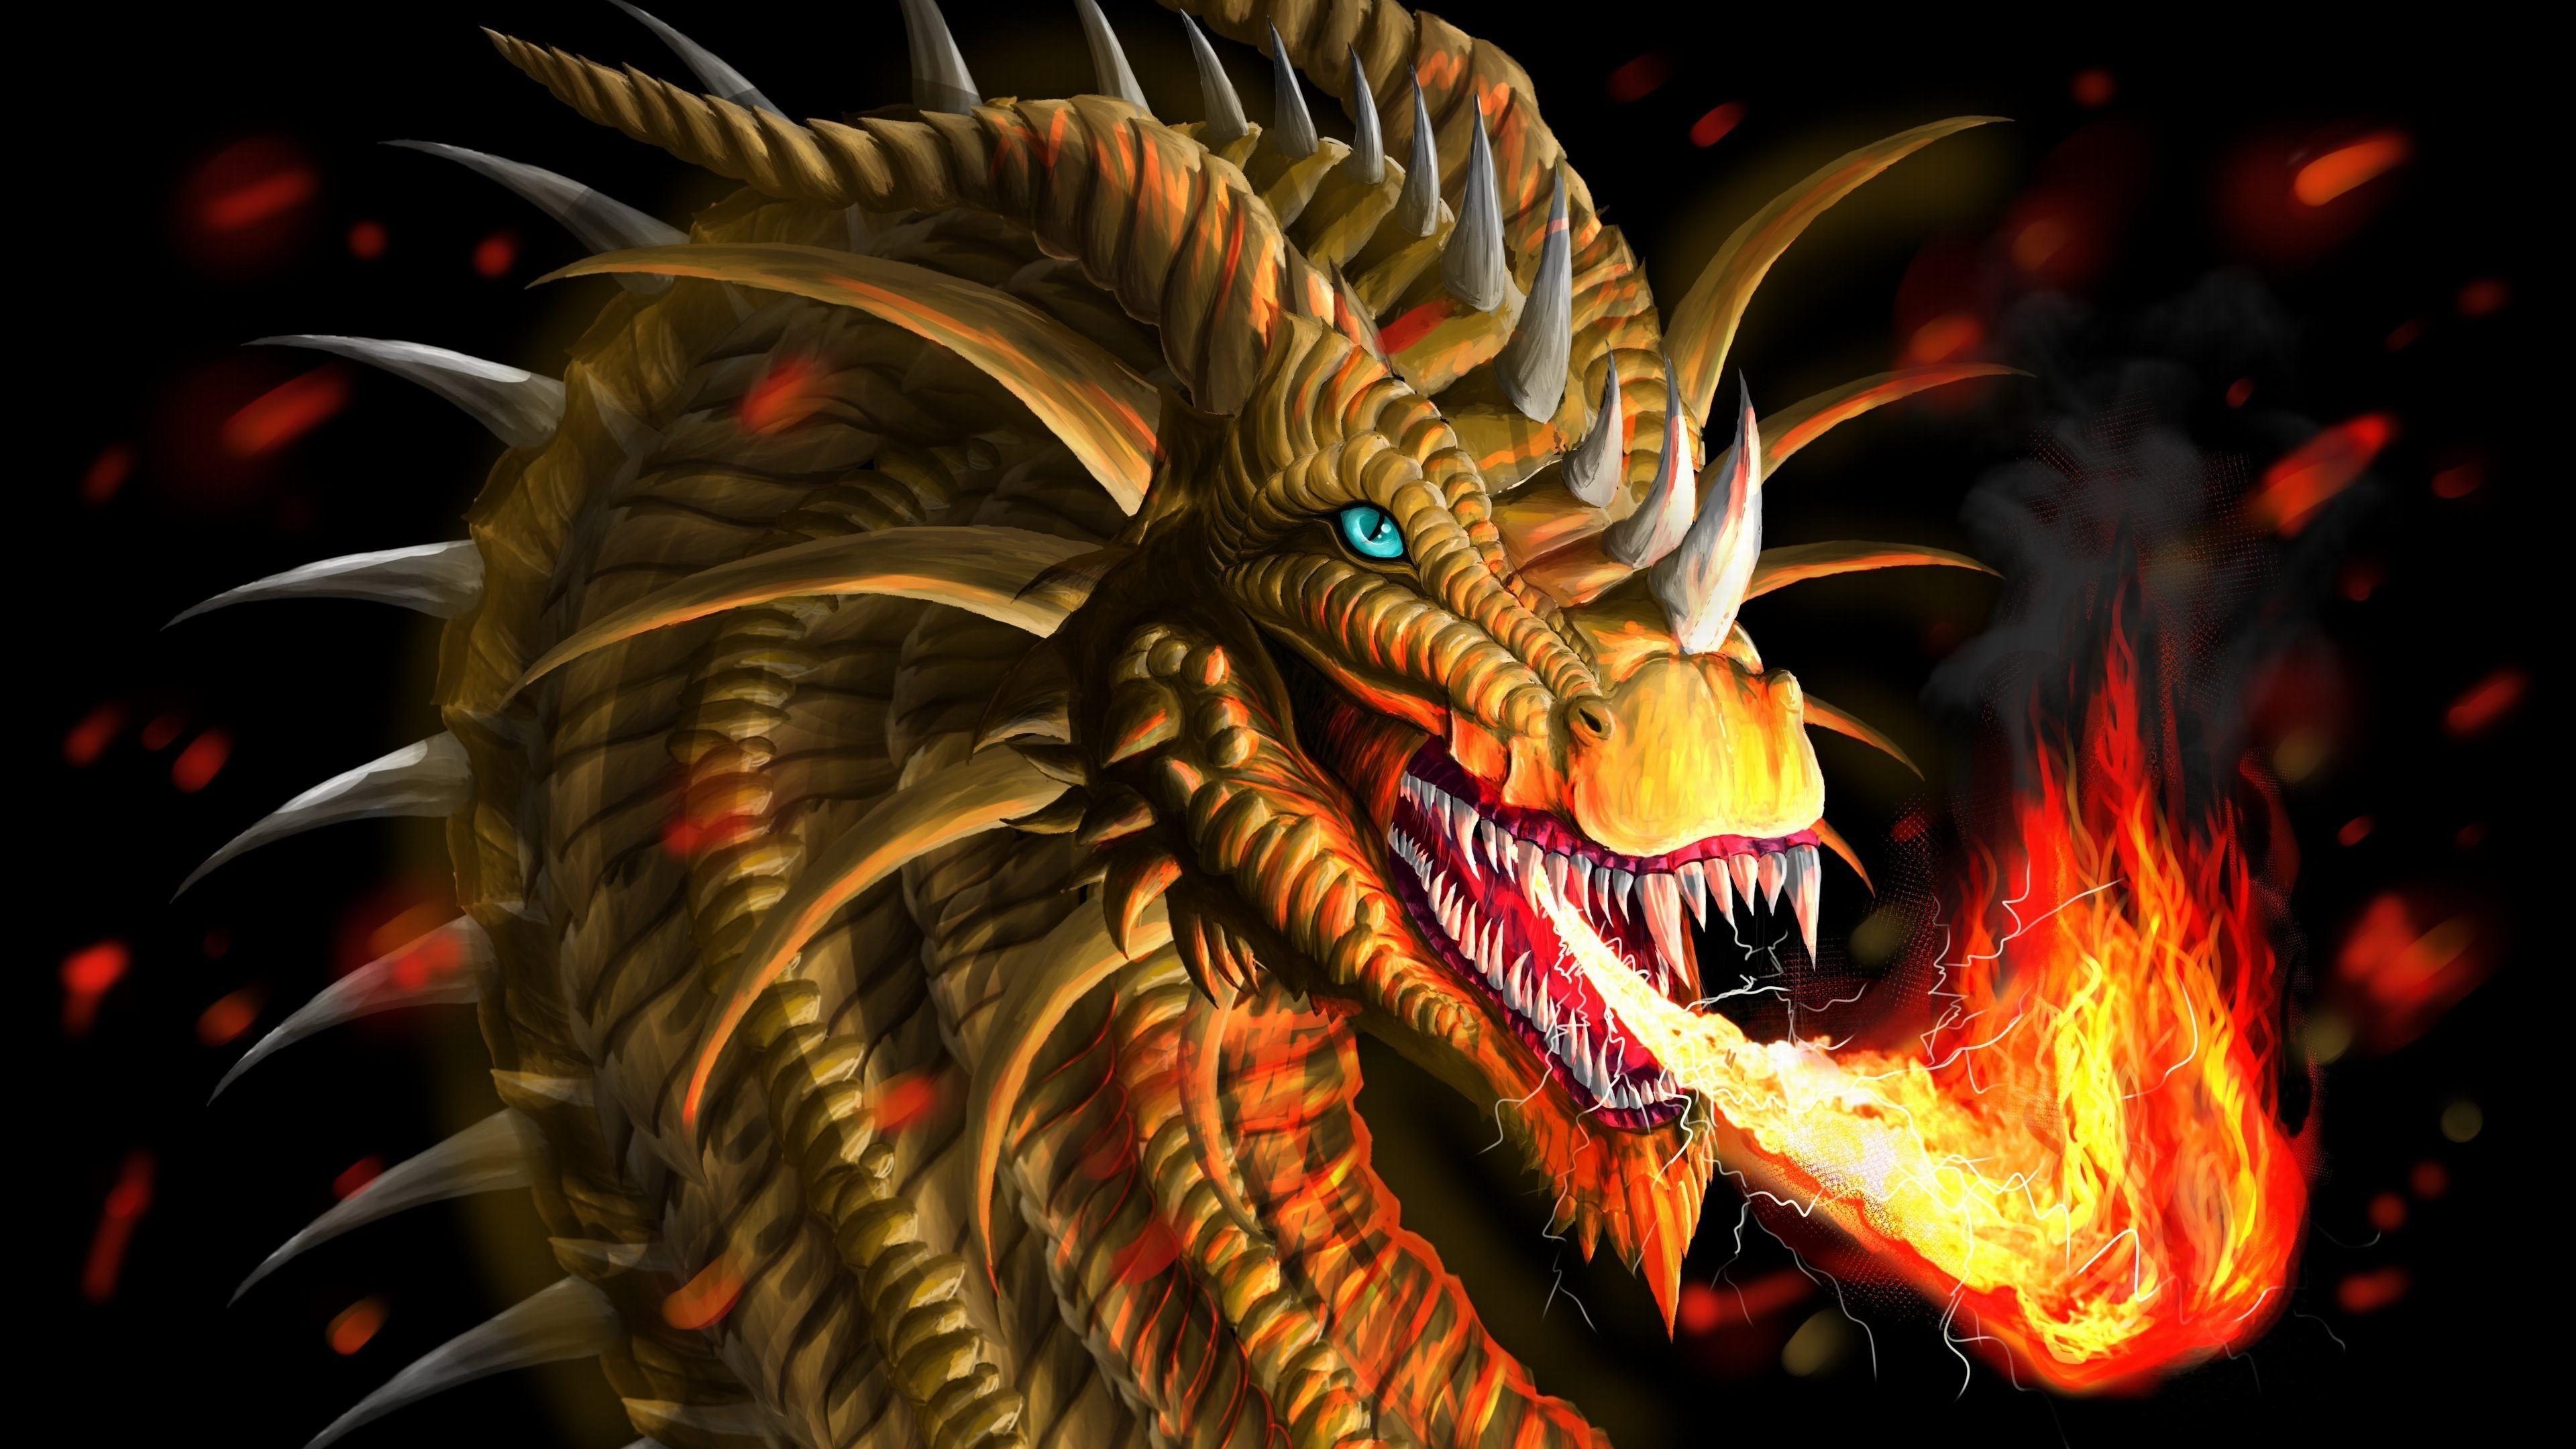 HD Dragon 4k Wallpaper. 0.695 MB